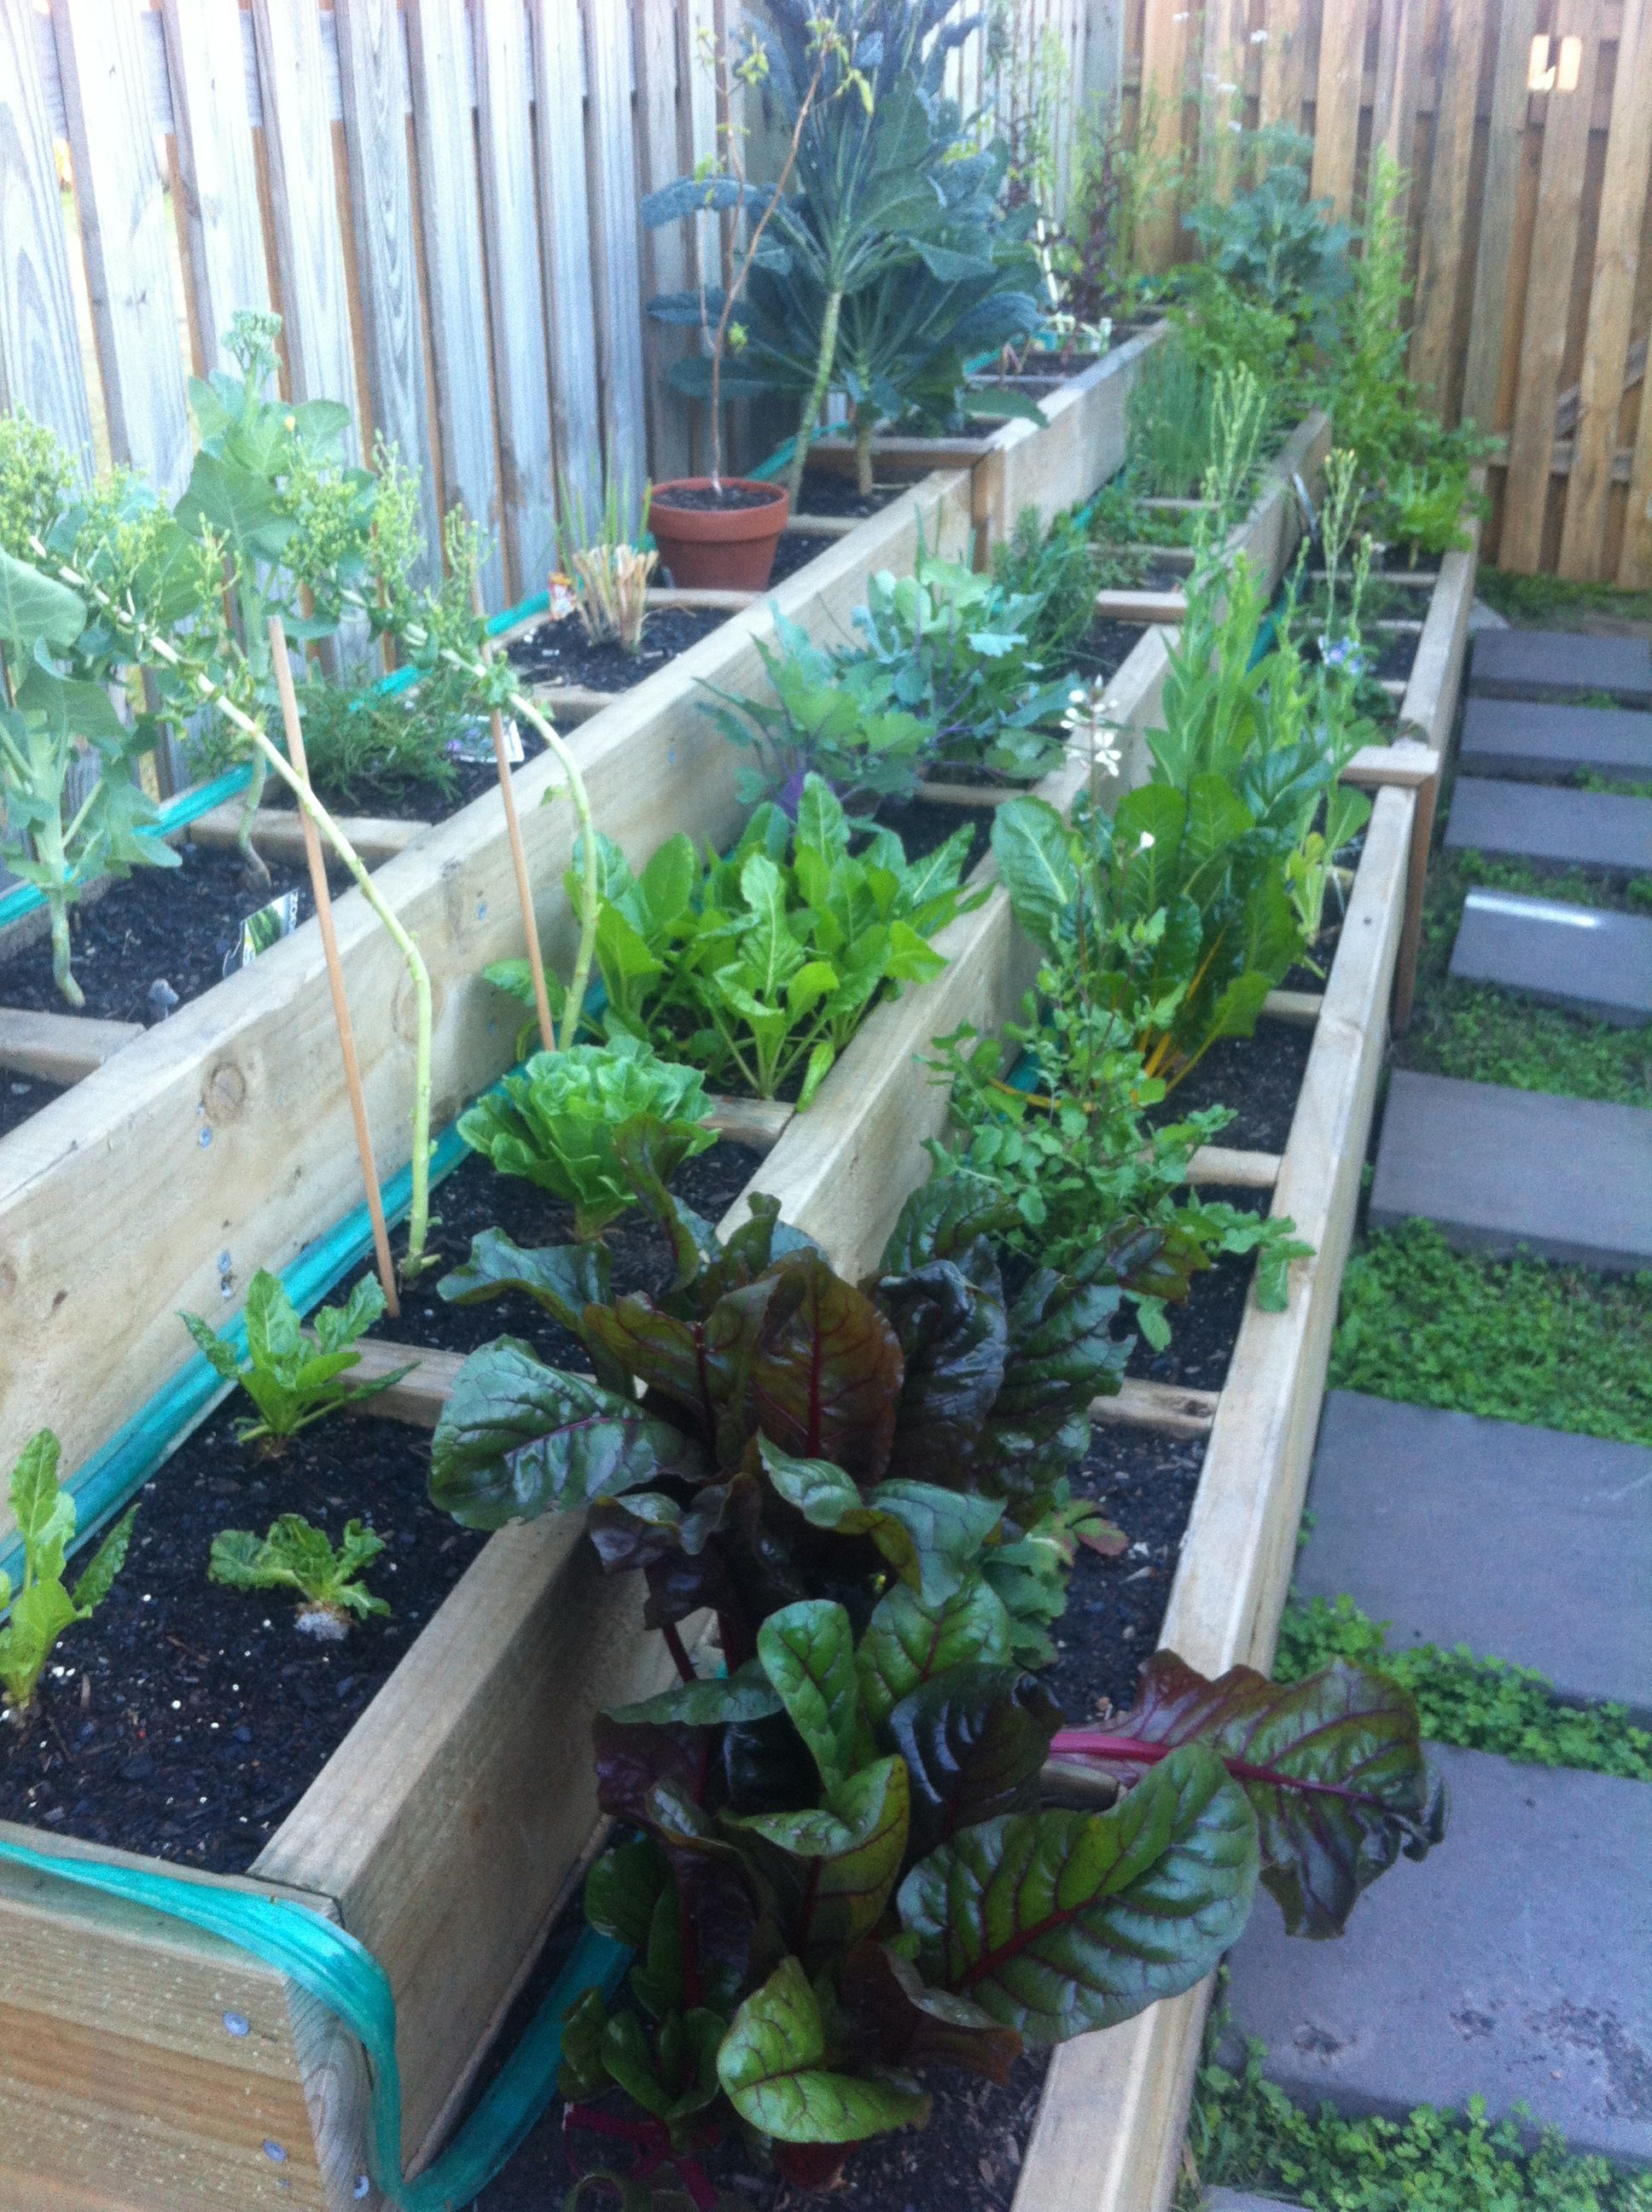 Segmented raised garden bed for herbs, veggies